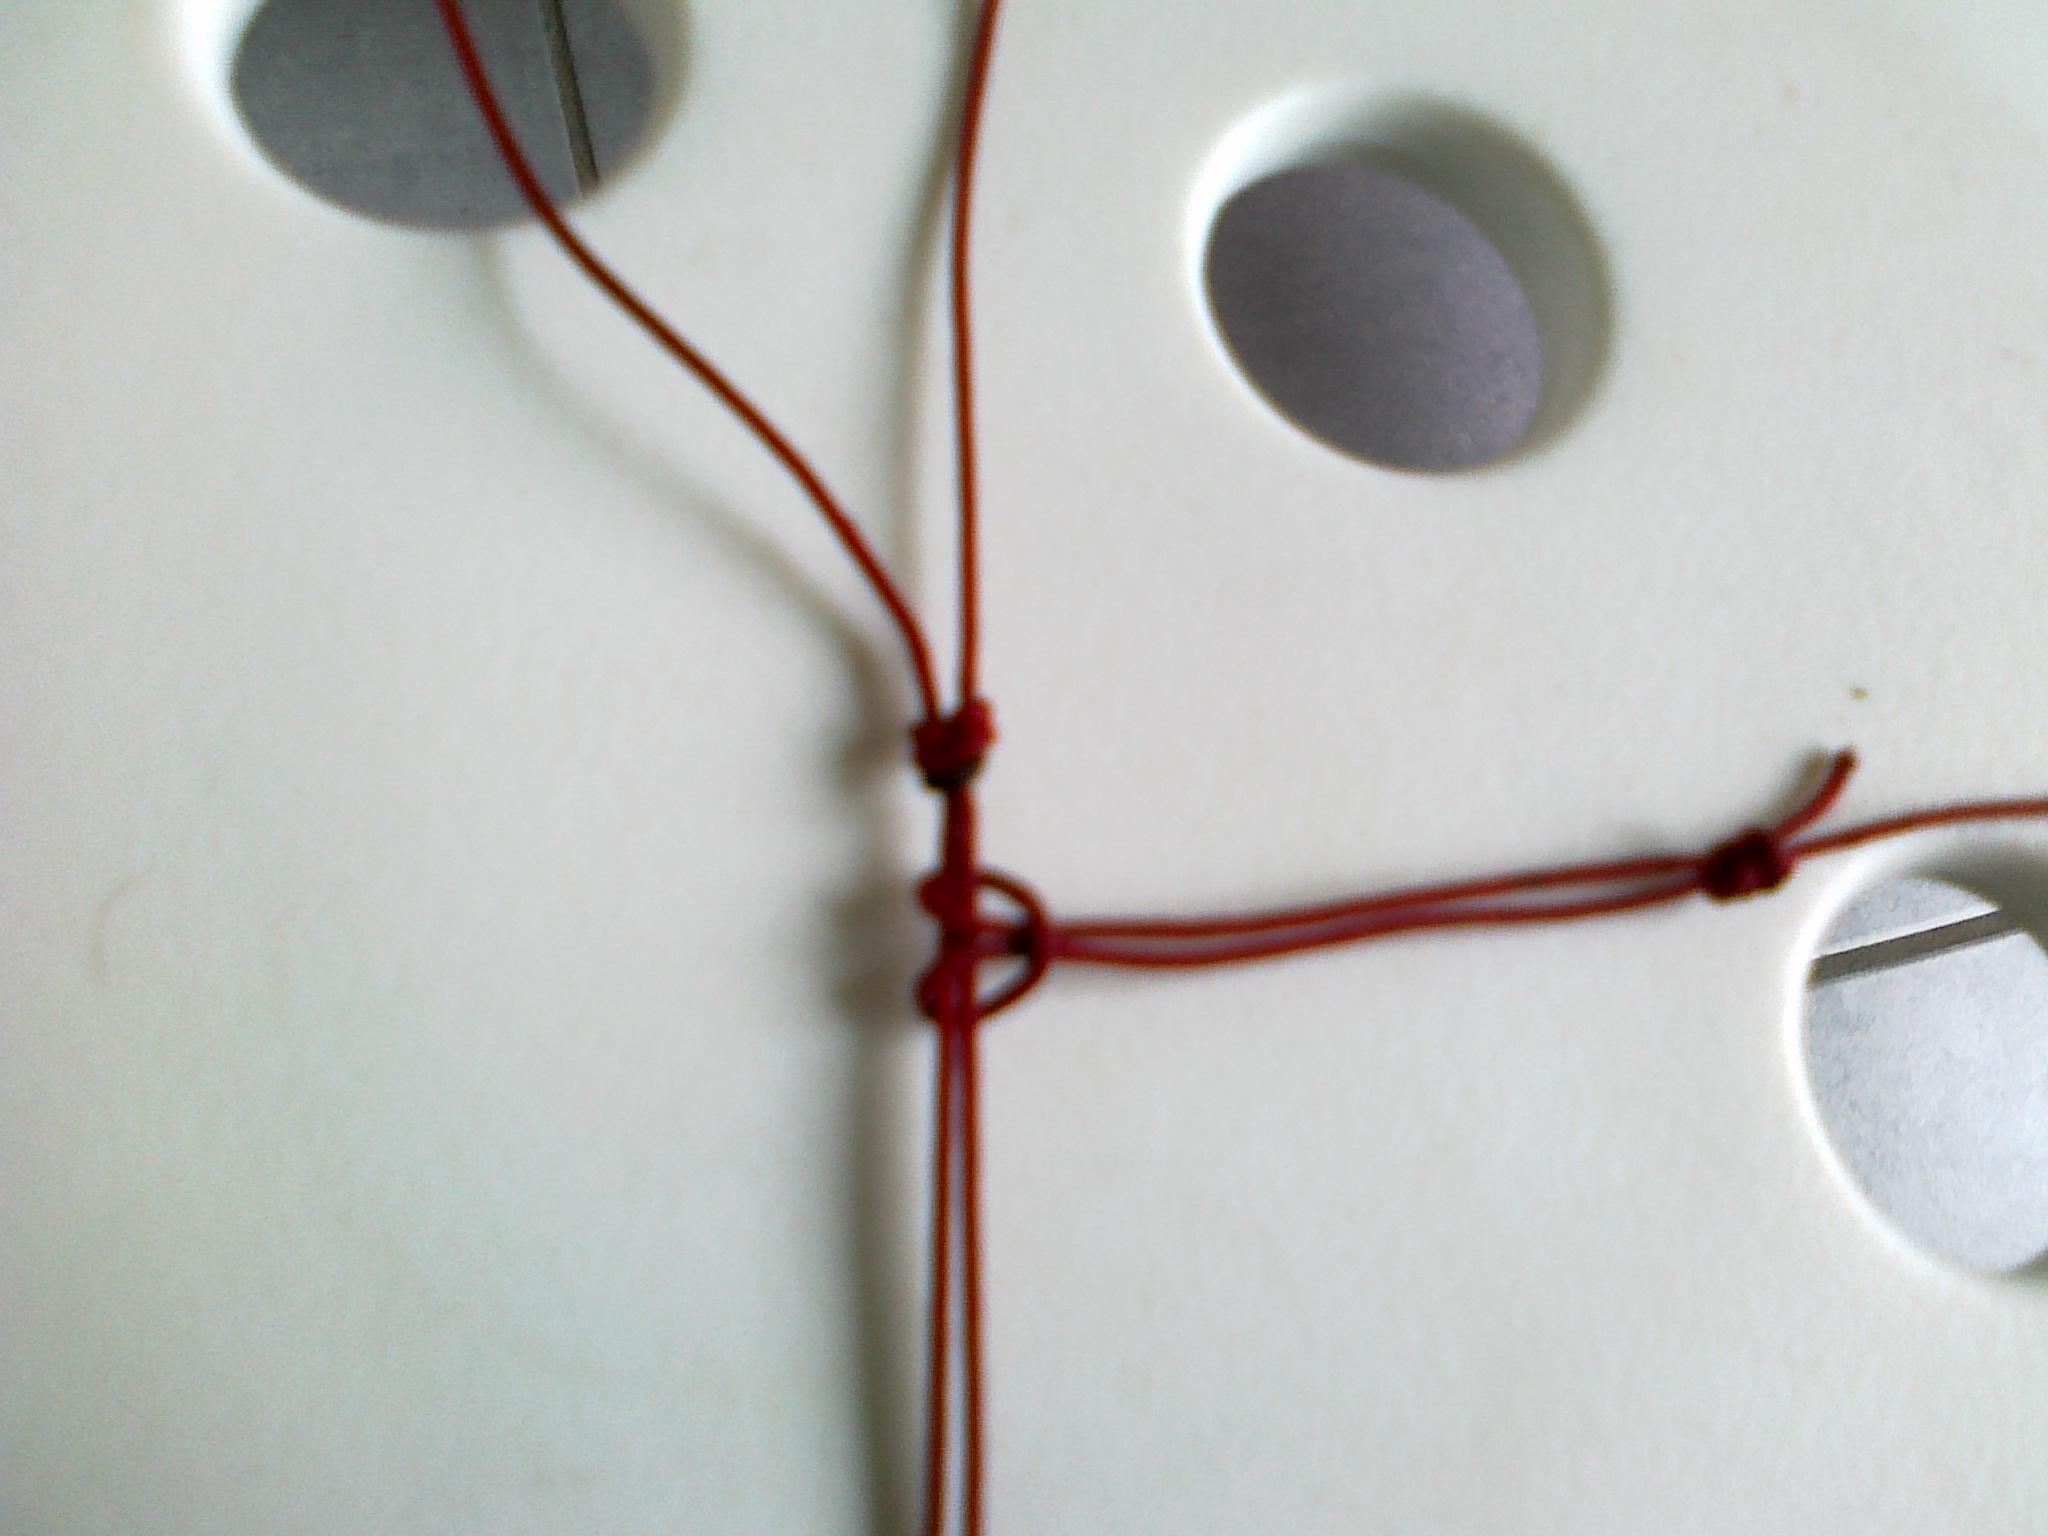 fabrication Vortex UL de Christian Derefat - Page 2 25179904102015319